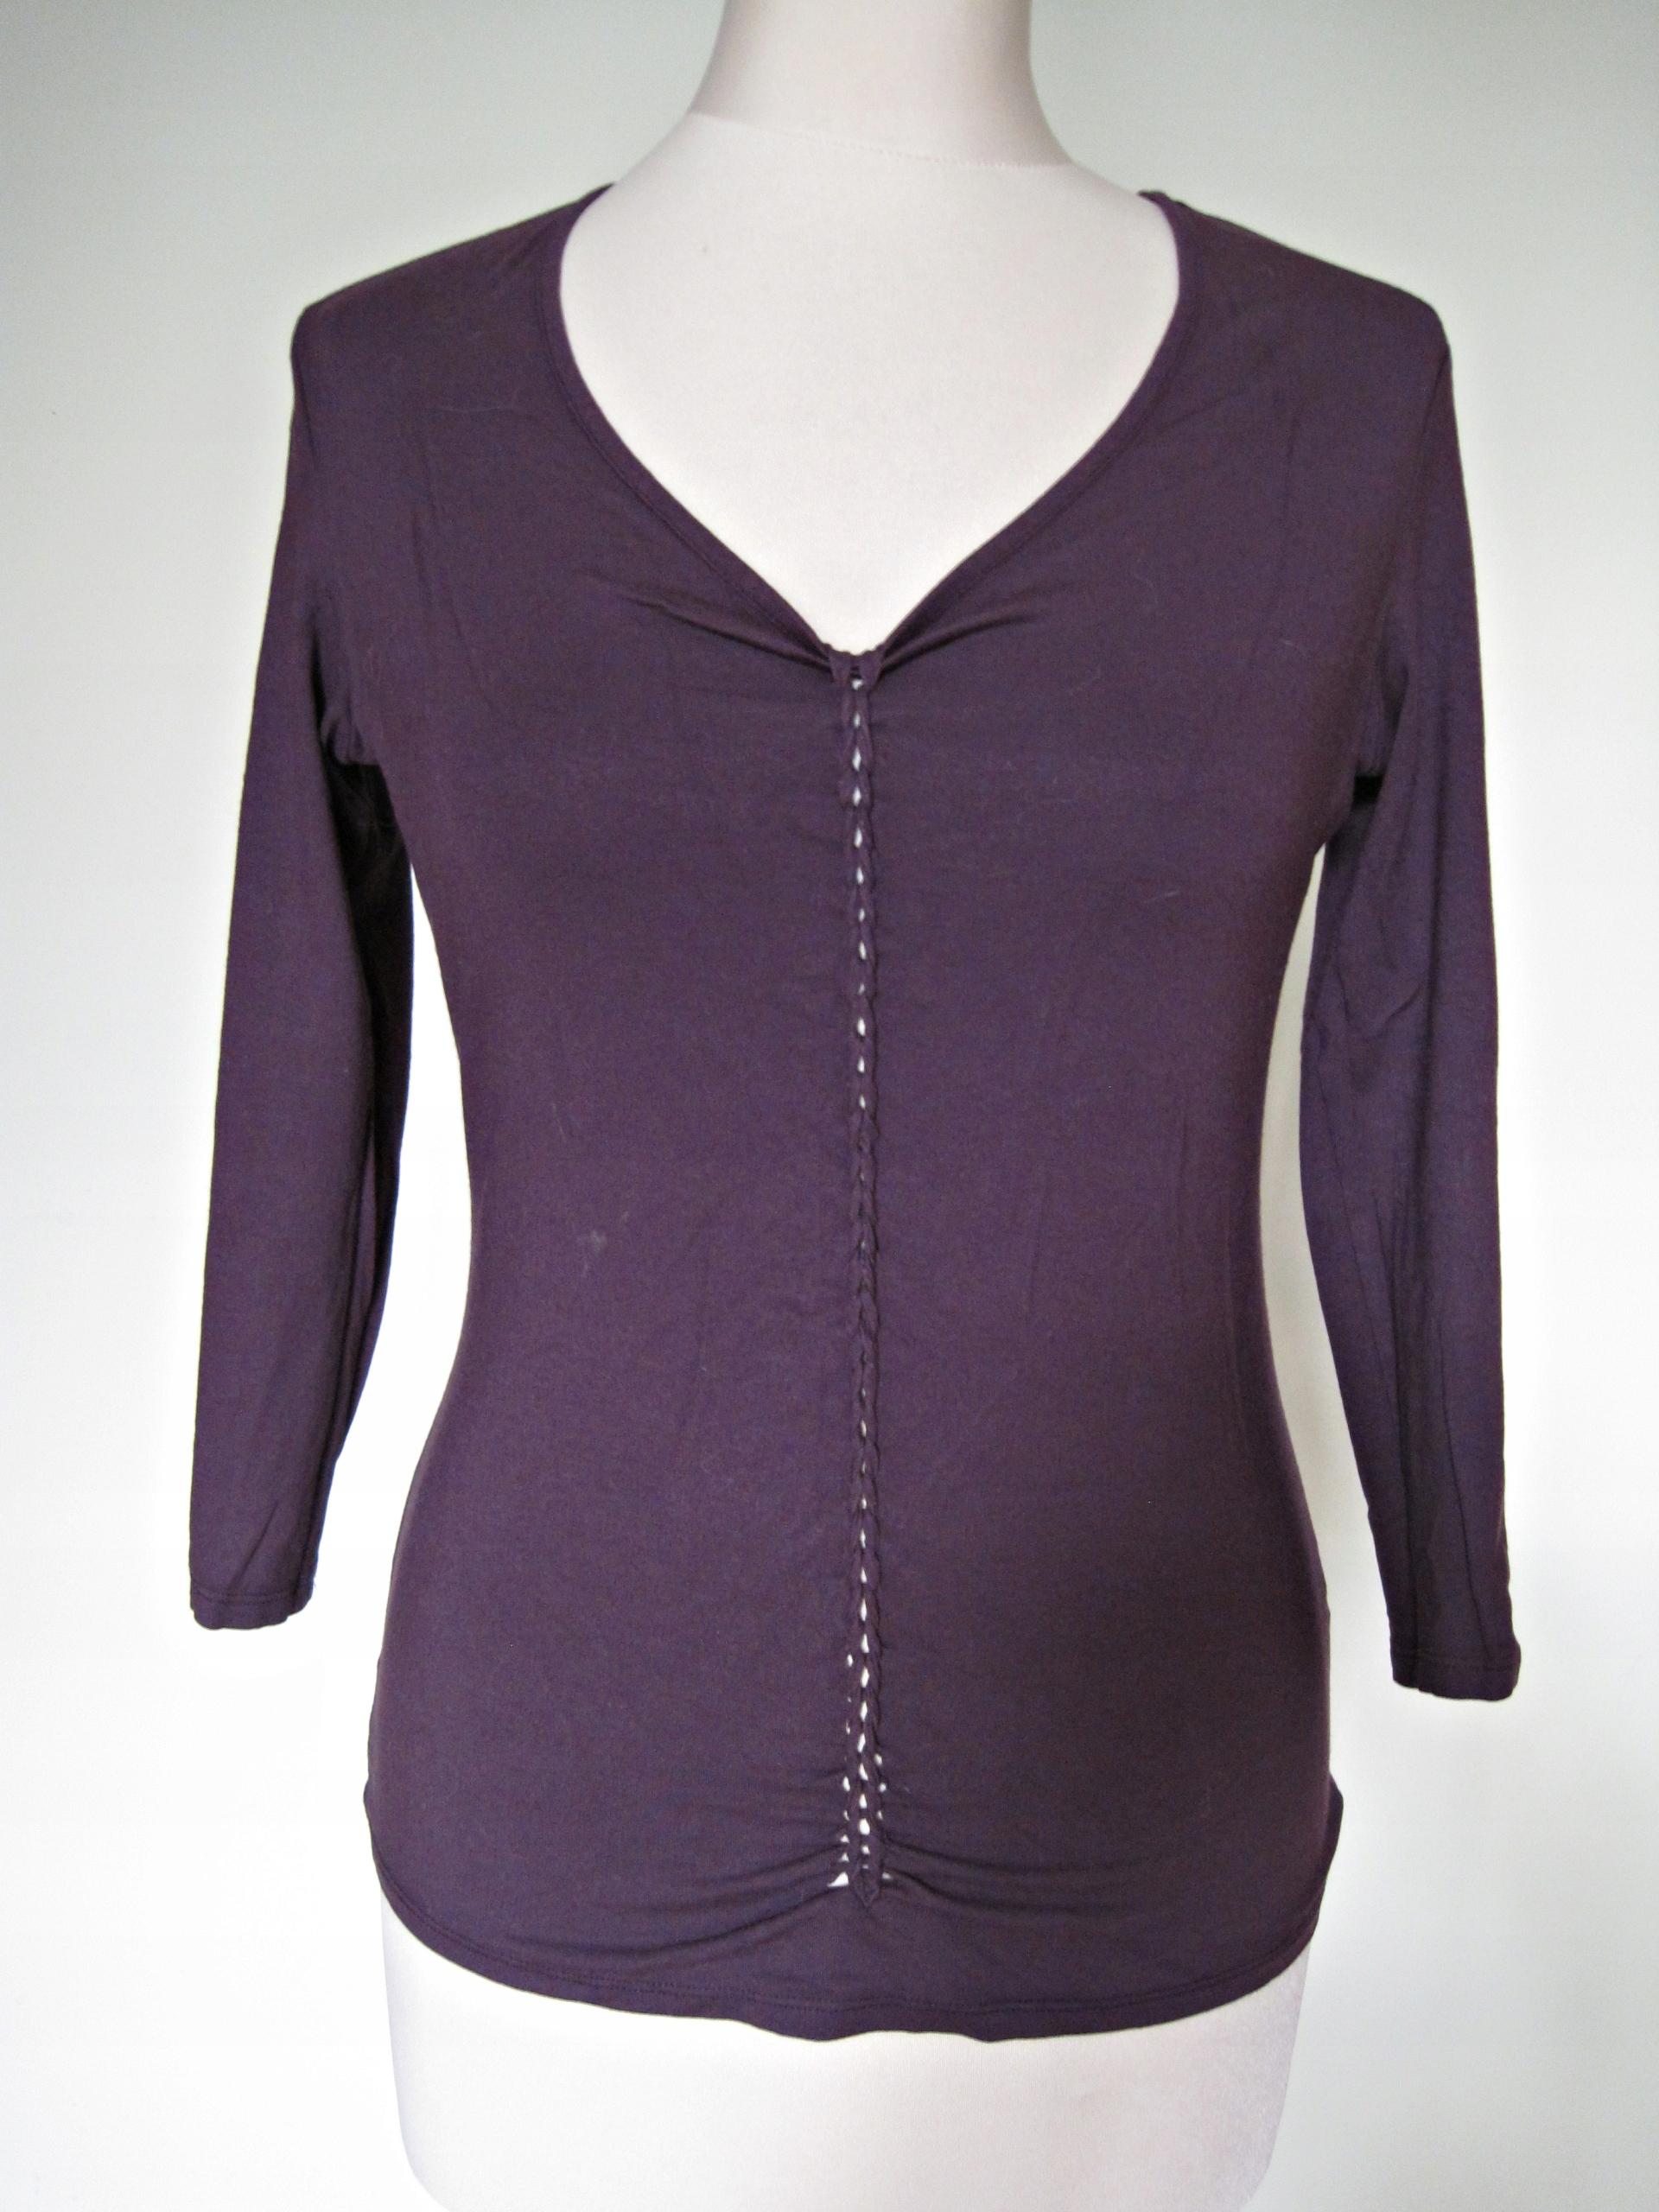 Unikatowa bluzka fiolet rozm. 36